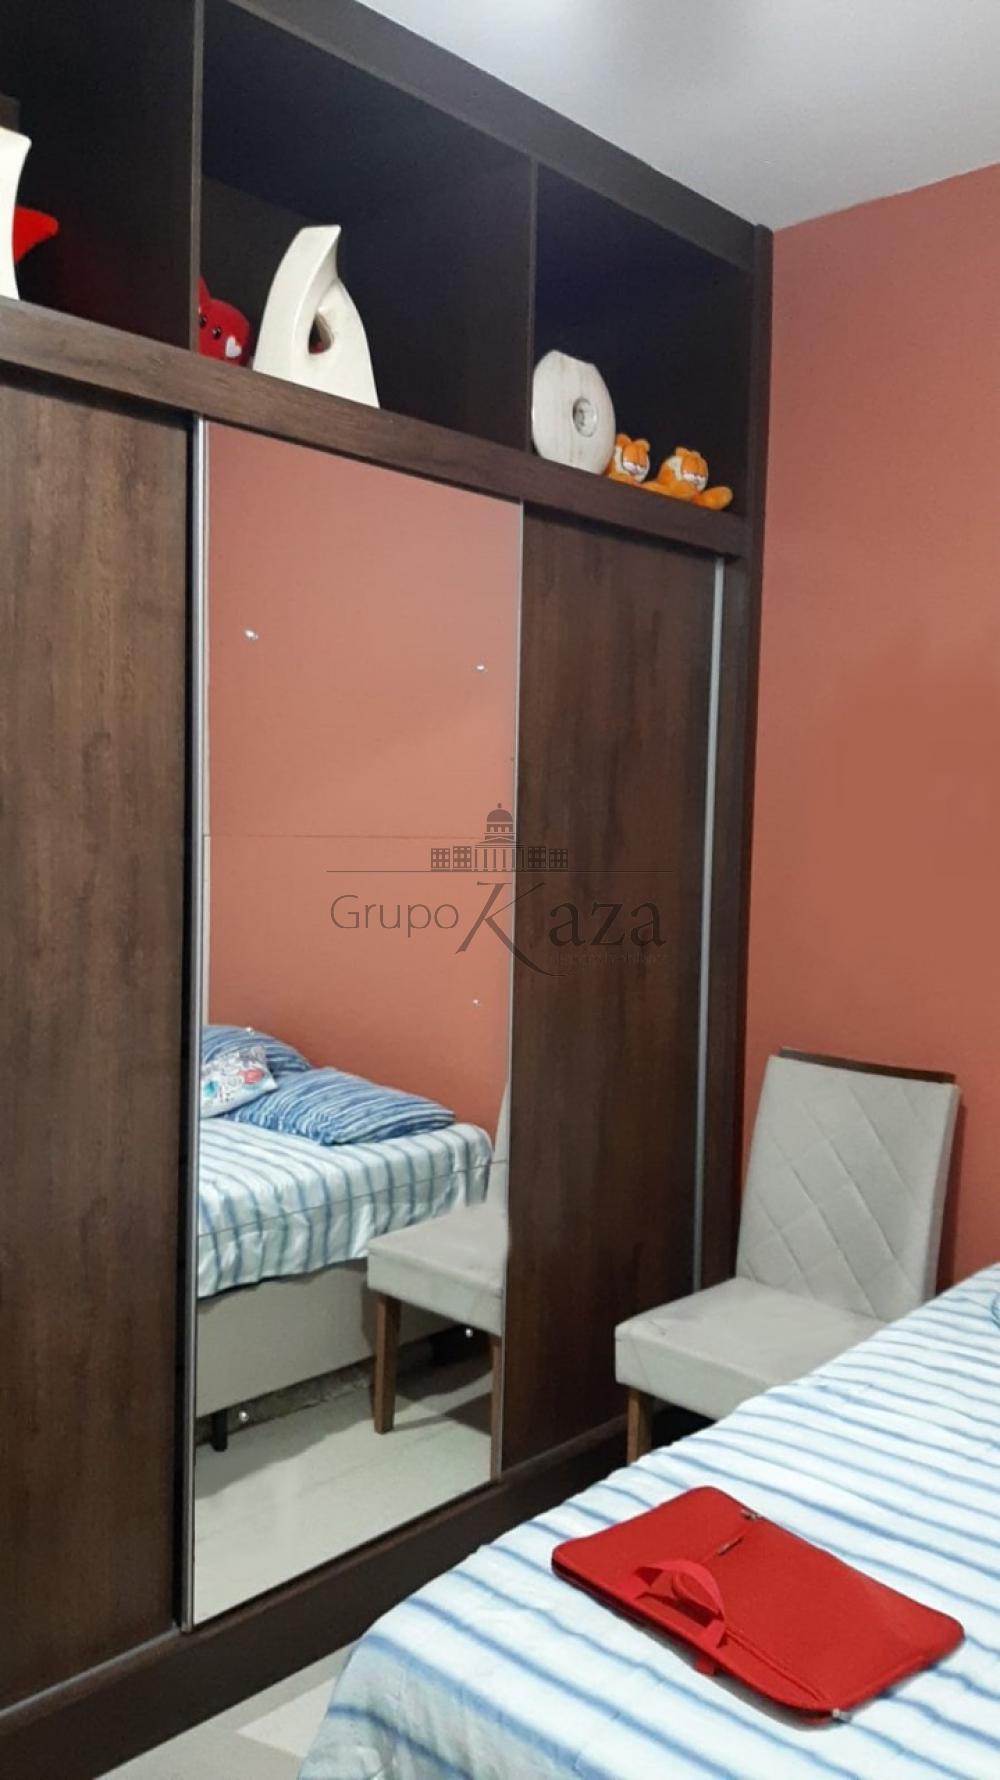 alt='Comprar Casa / Térrea em Caraguatatuba R$ 590.000,00 - Foto 8' title='Comprar Casa / Térrea em Caraguatatuba R$ 590.000,00 - Foto 8'